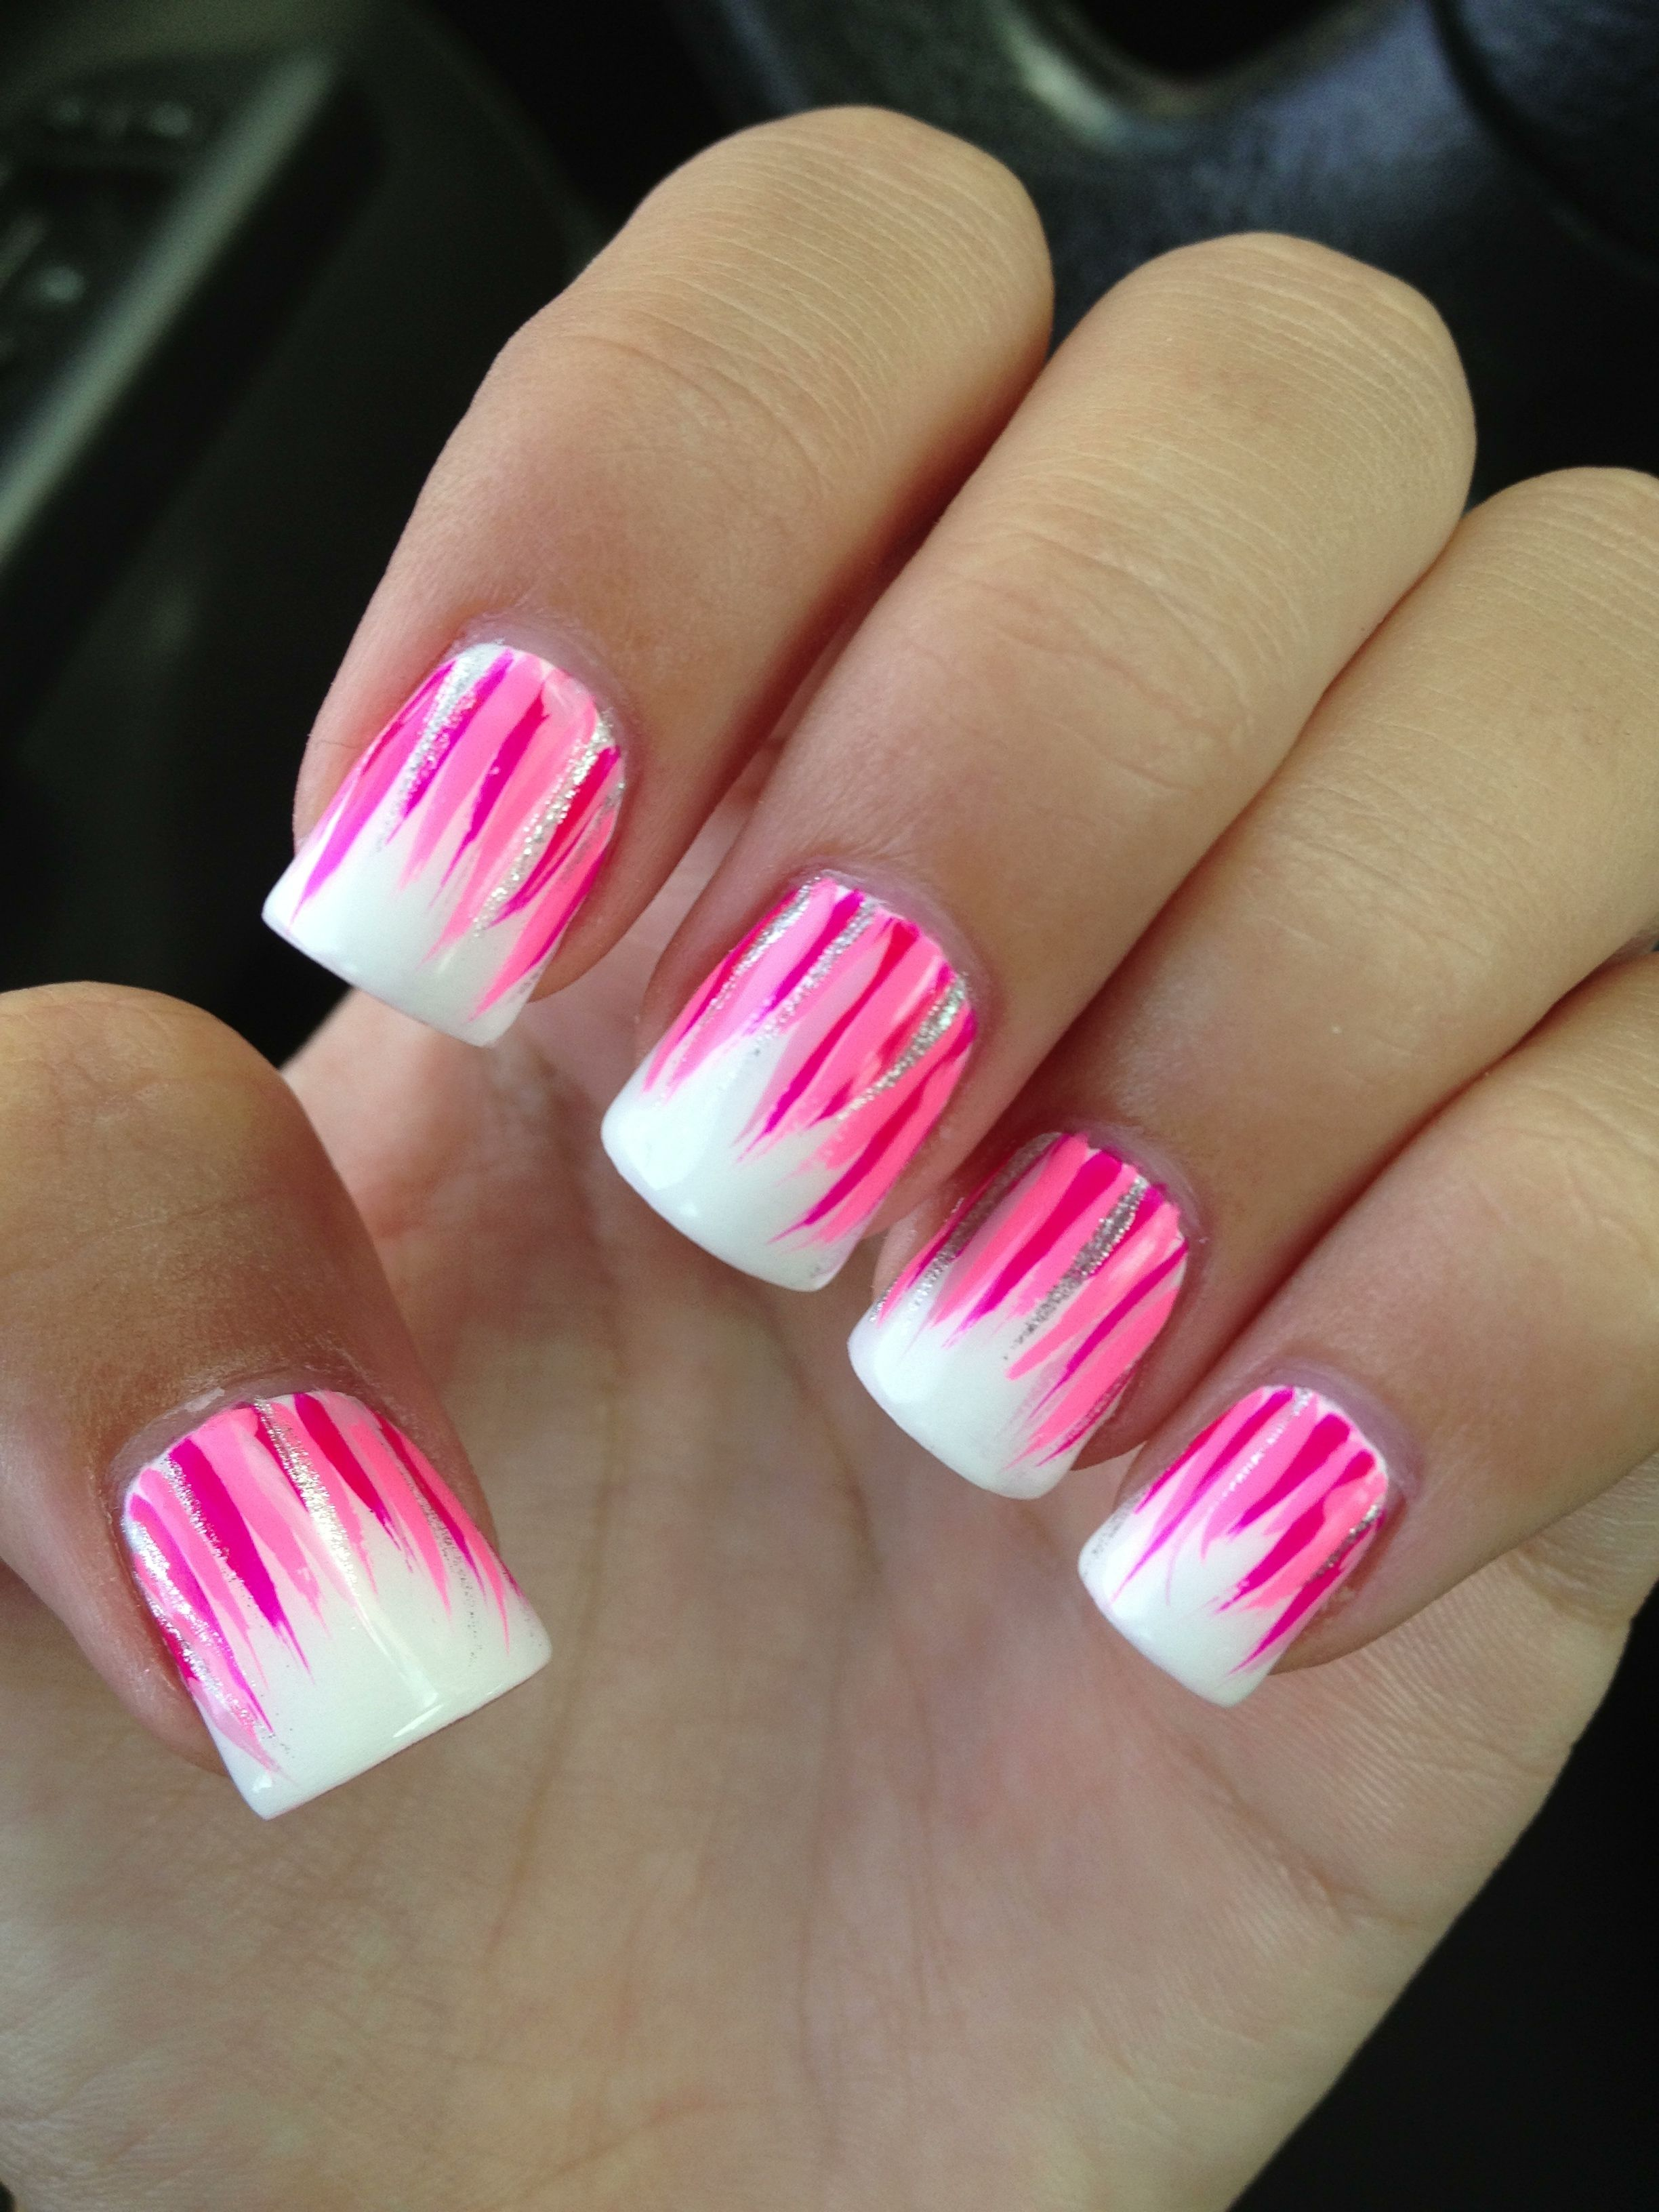 Pin by toni bradford on organize pinterest nail art nails and